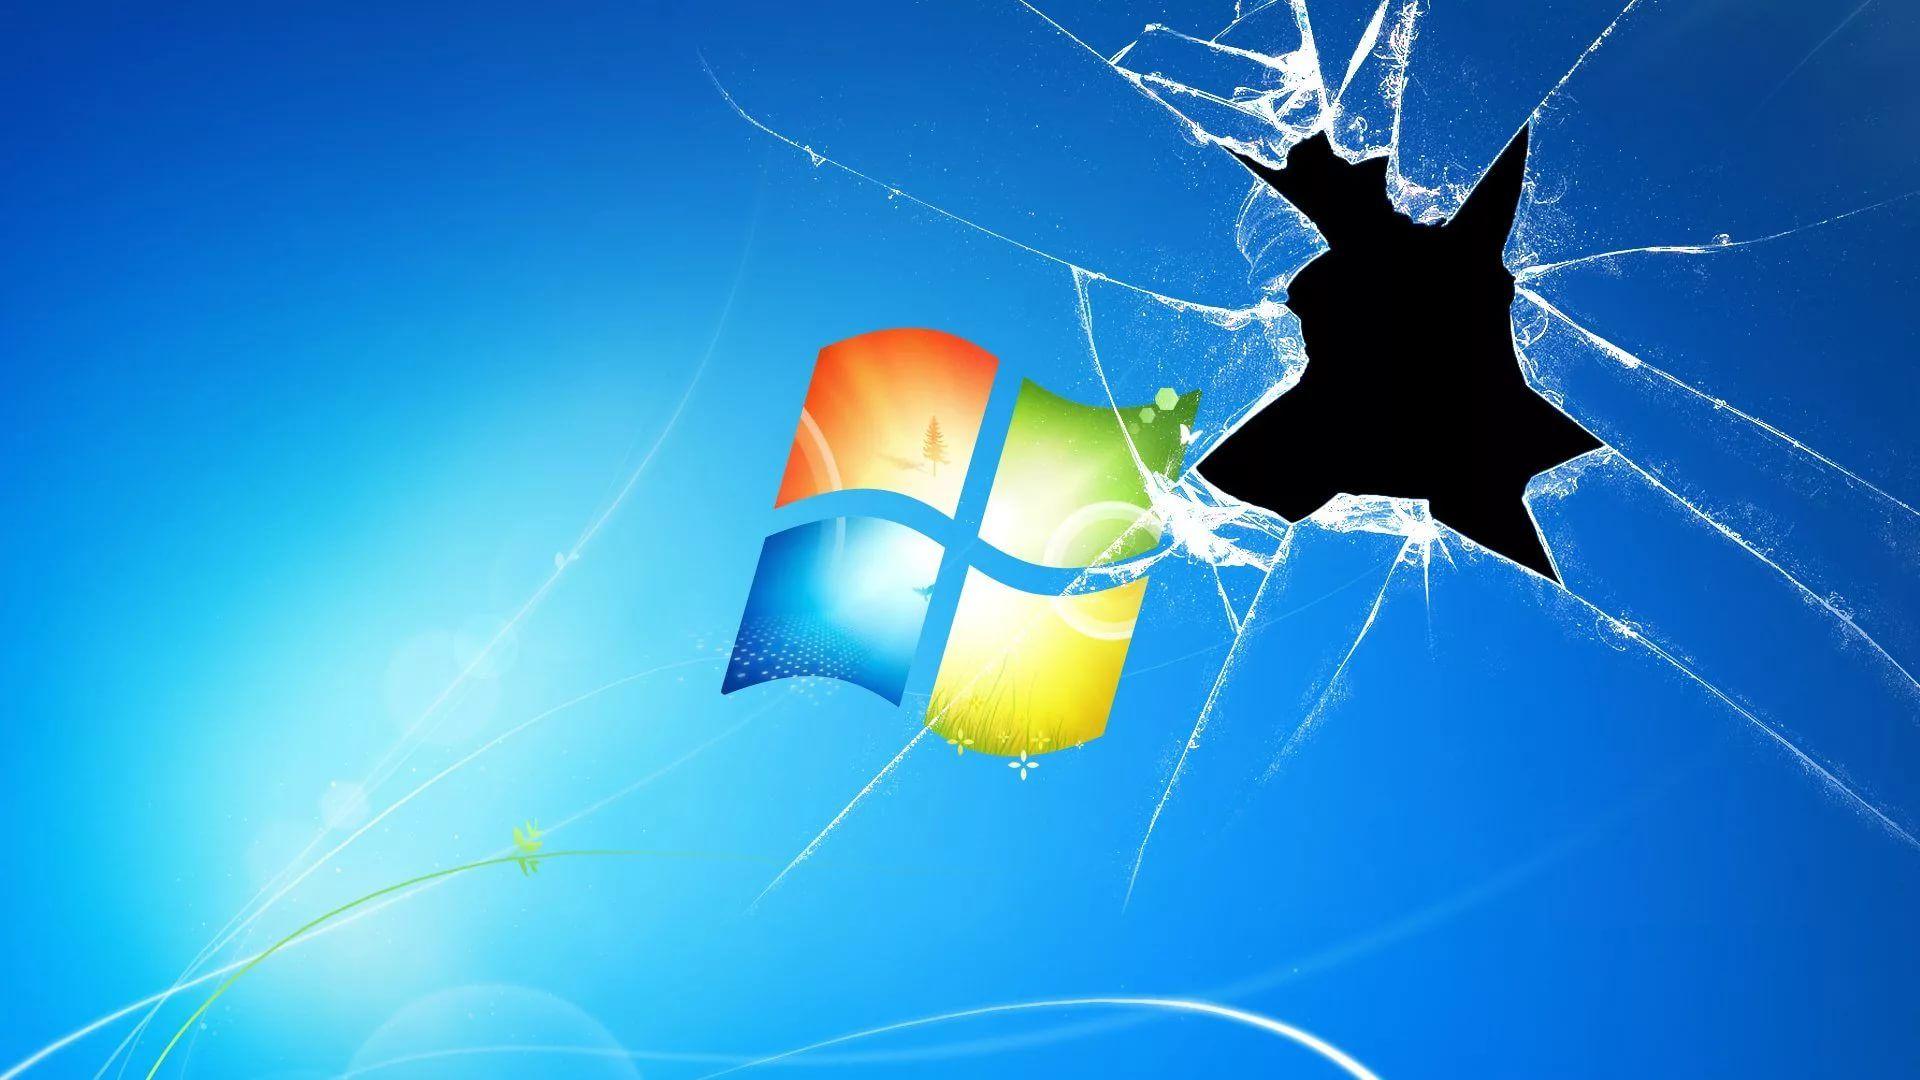 Broken Screen wallpaper image hd